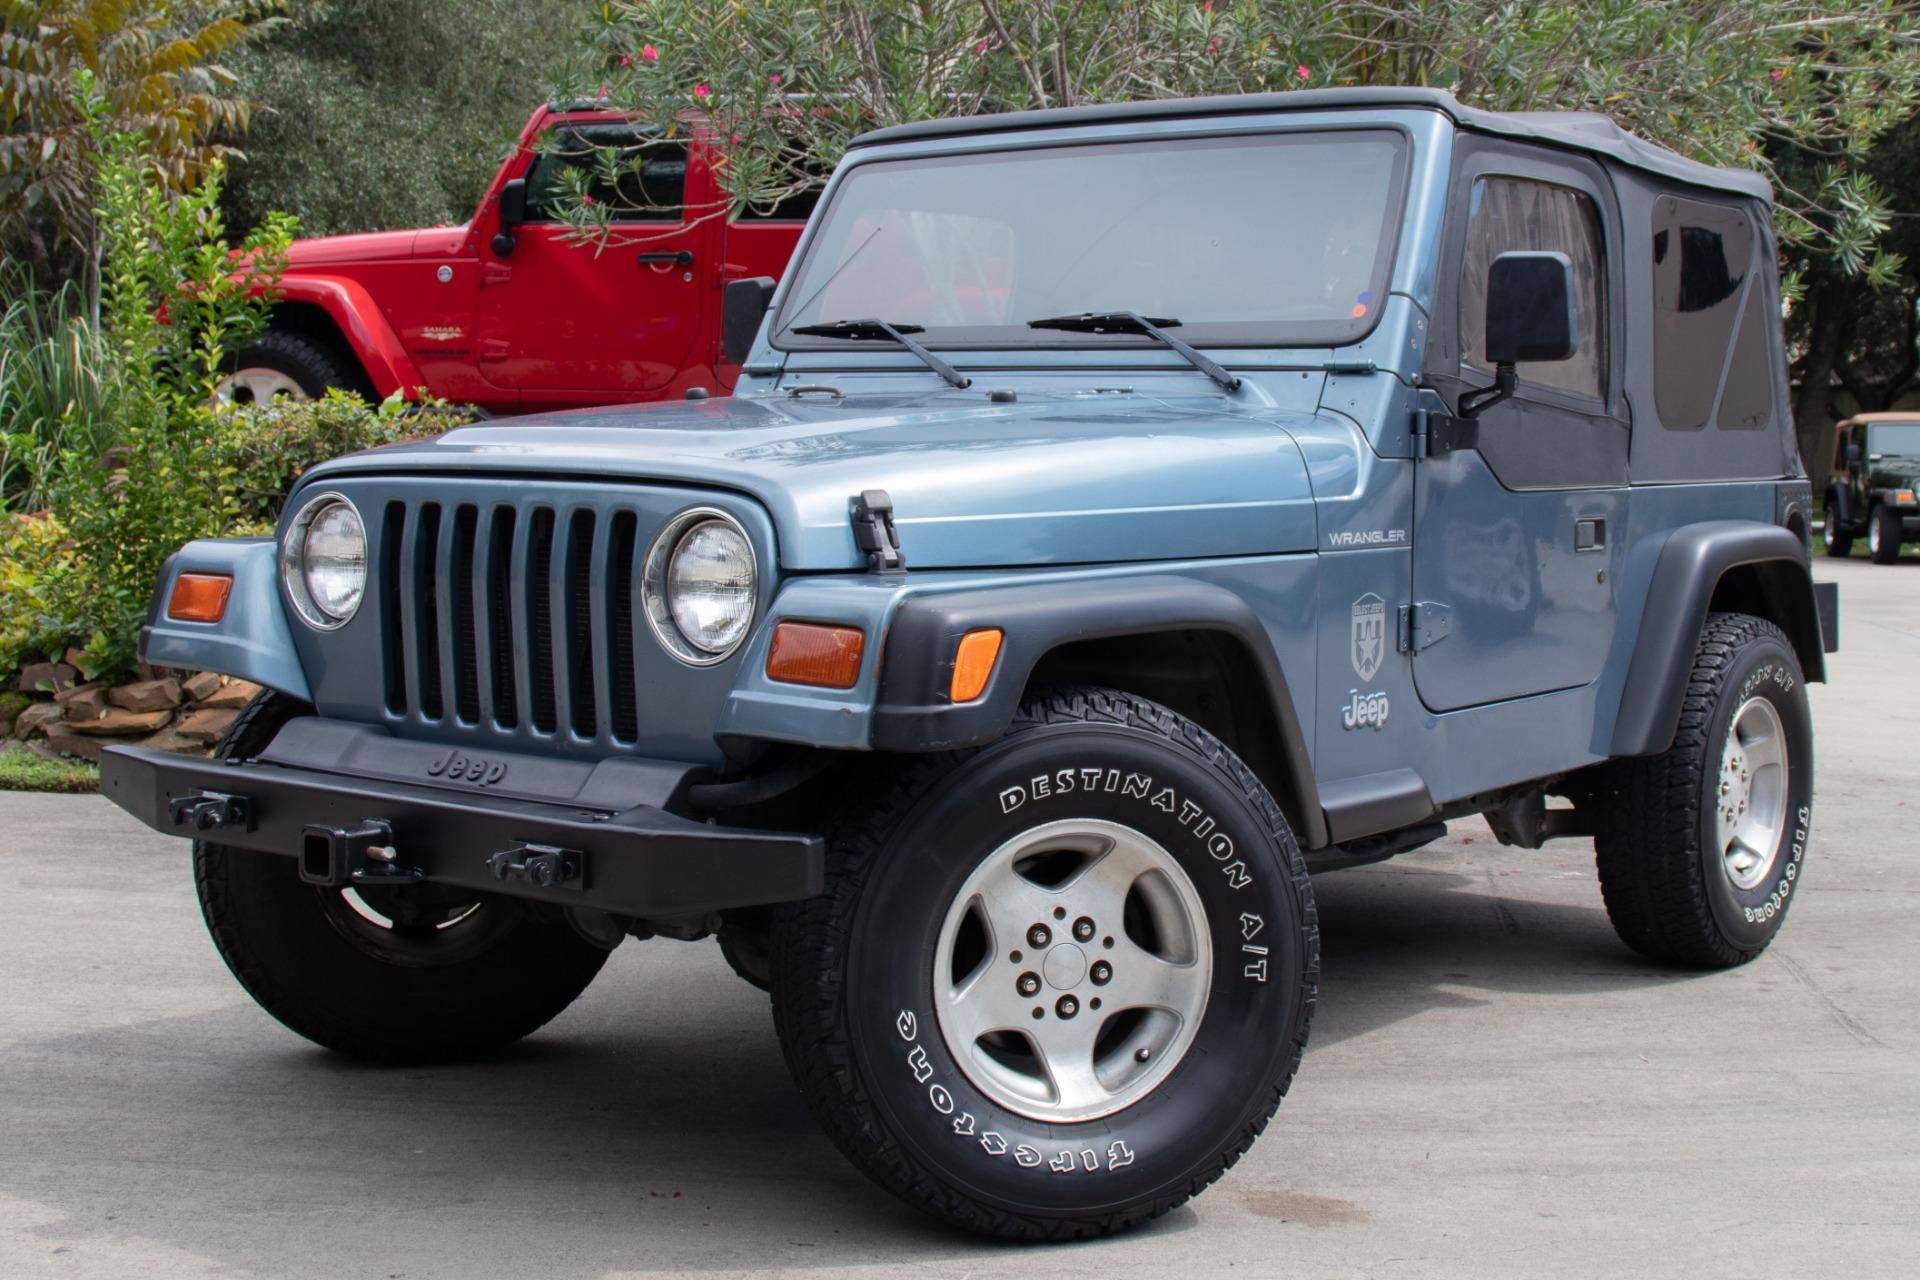 Used-1998-Jeep-Wrangler-2dr-SE